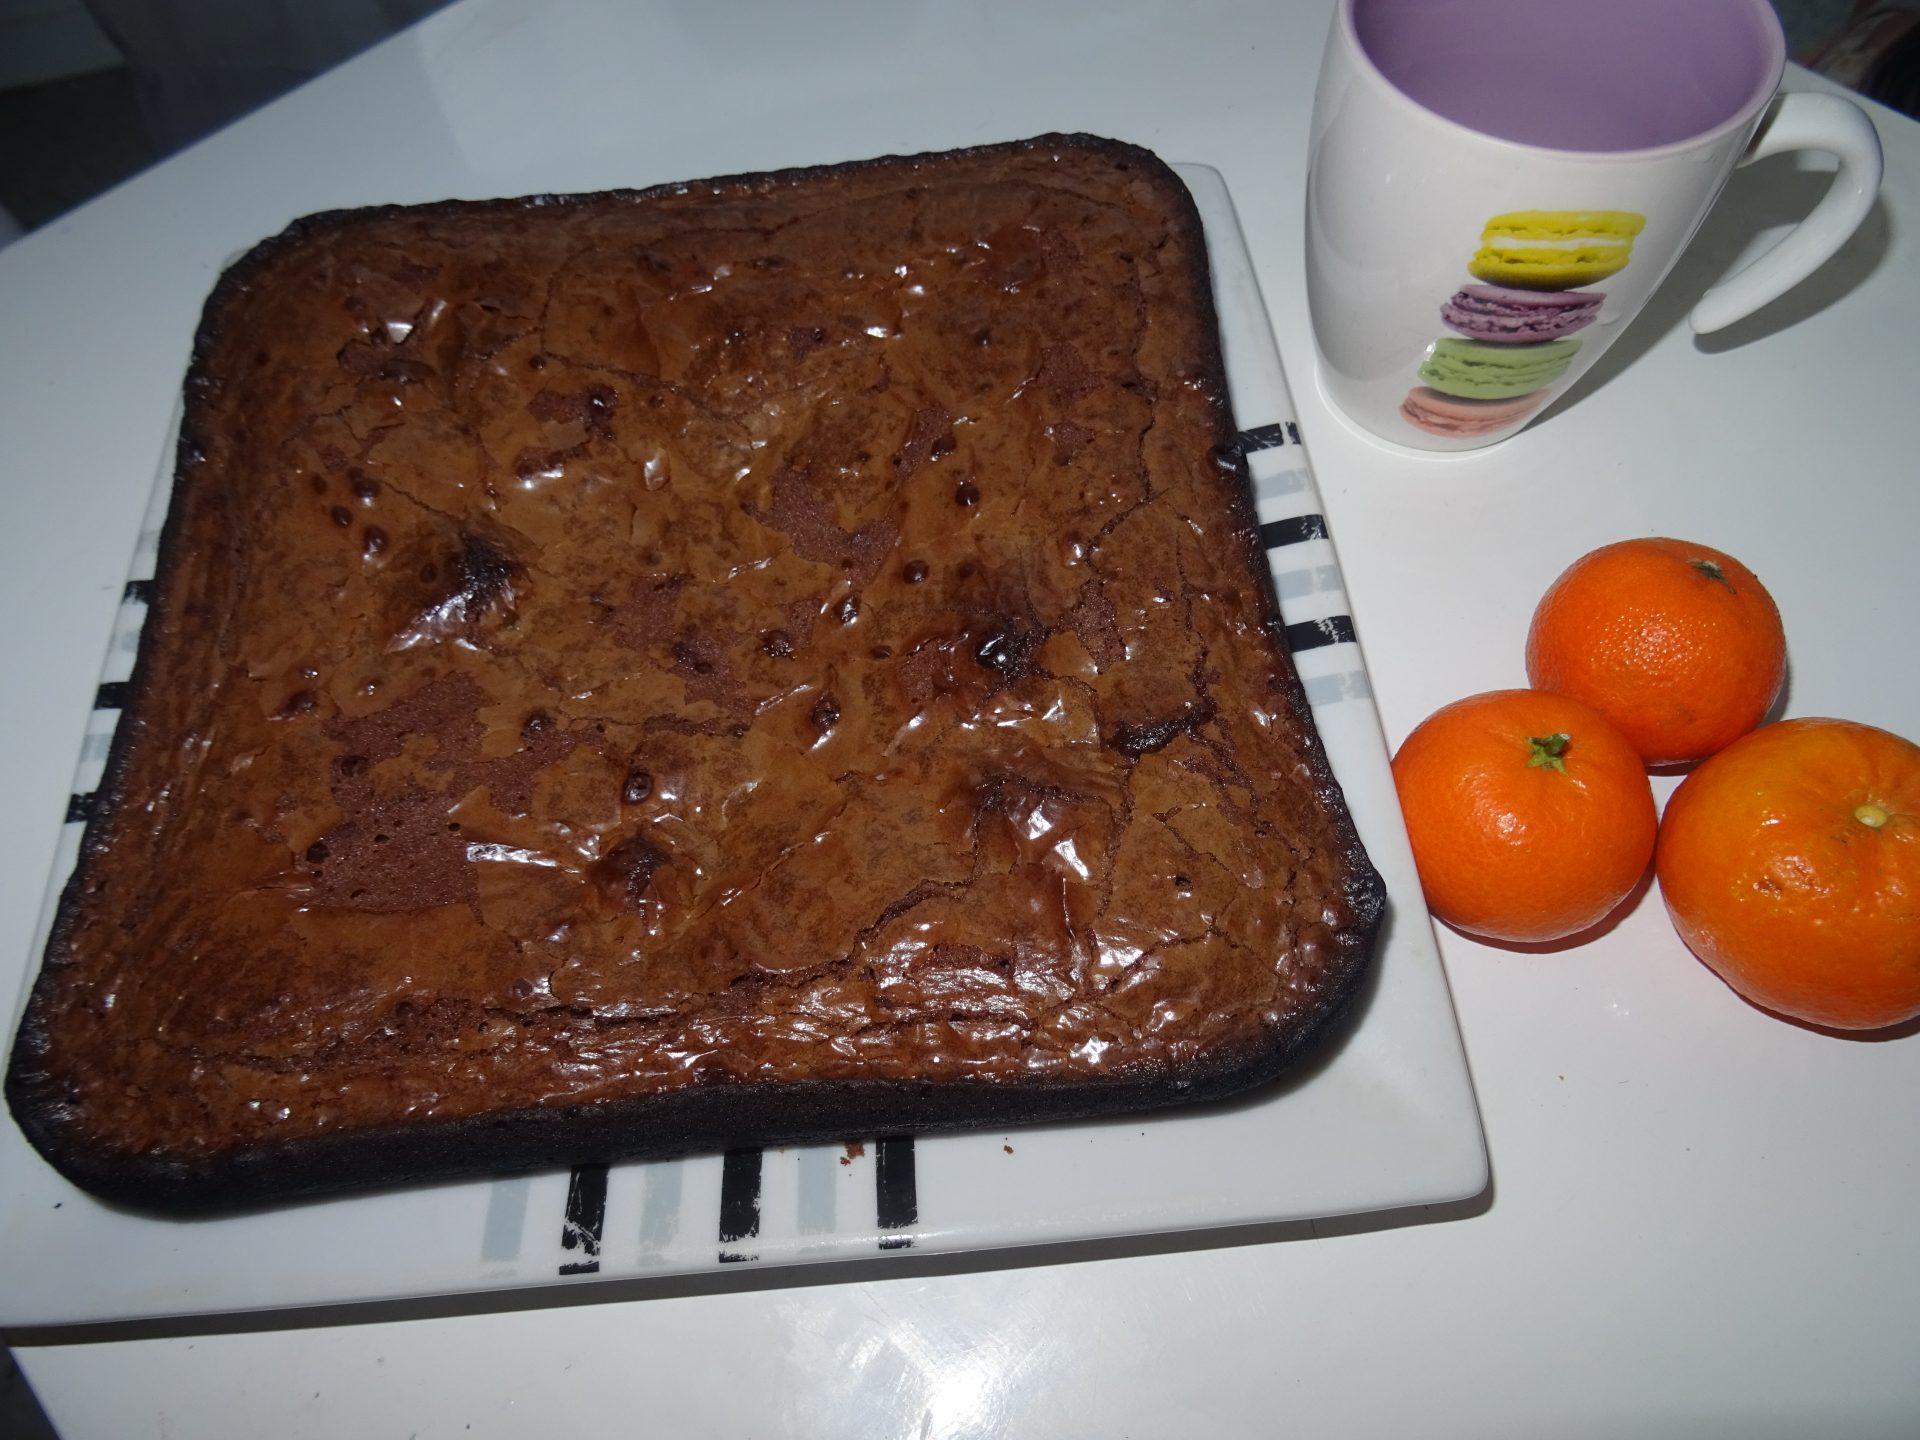 Brownies tout simple au chocolat